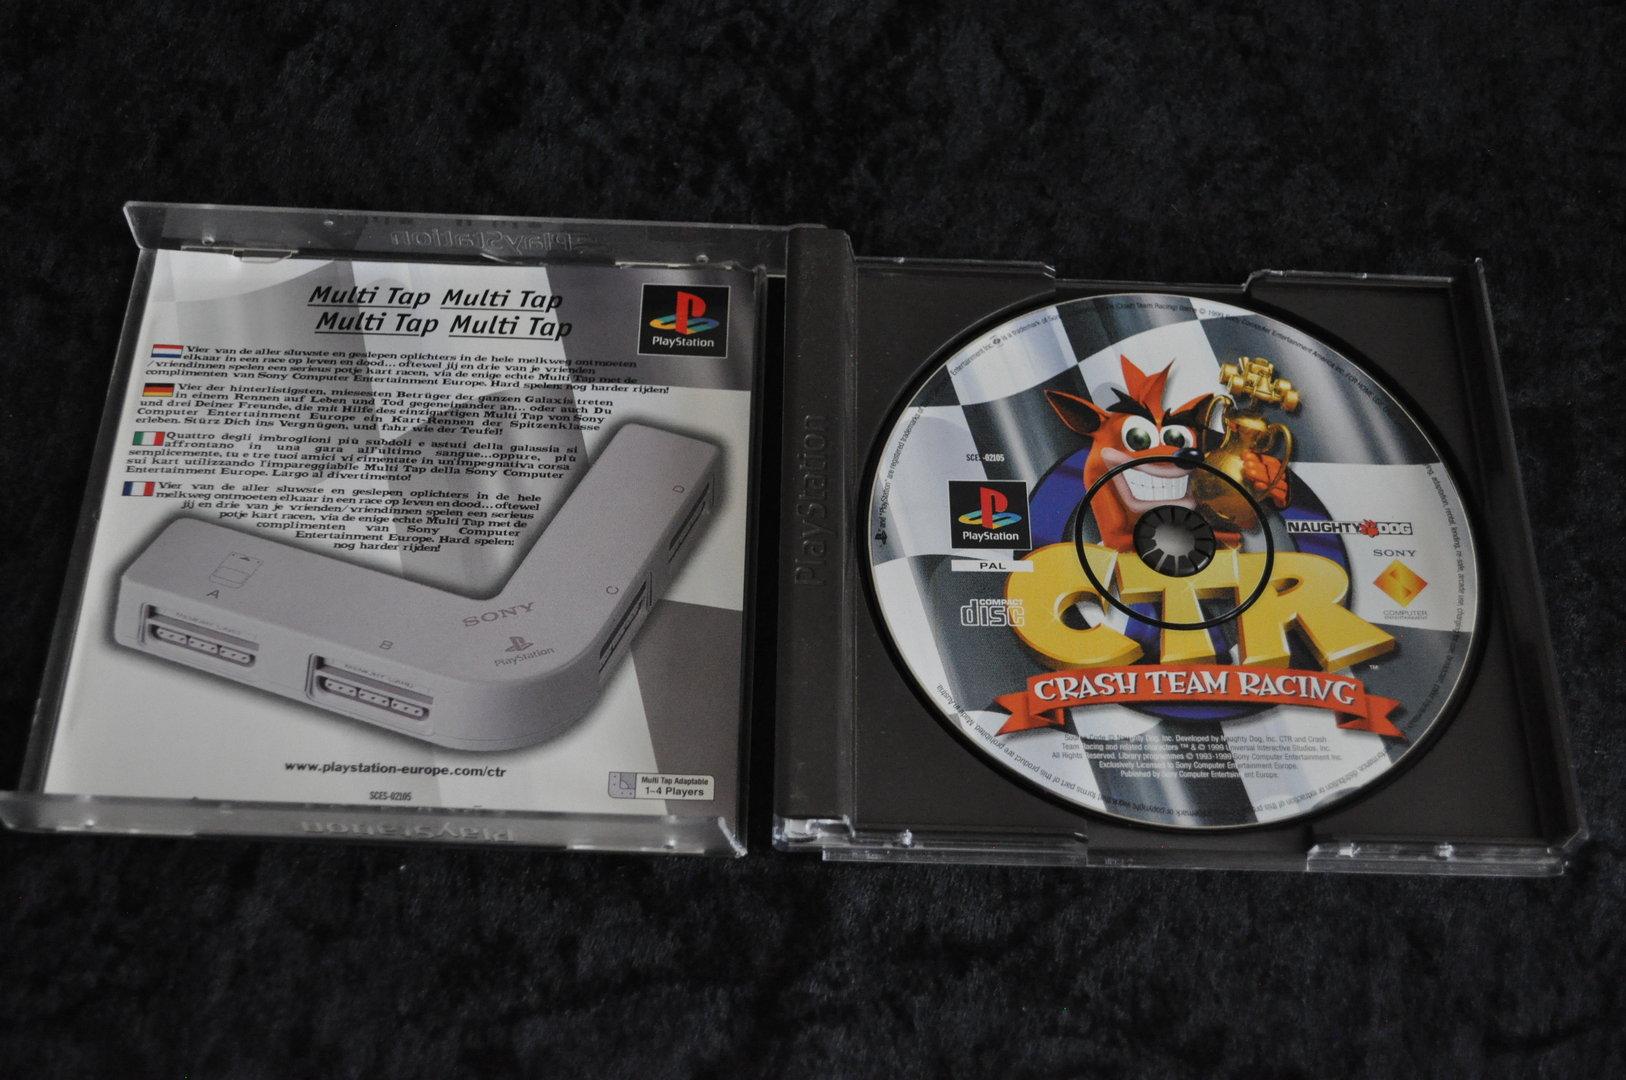 Playstation1 CTR crash team racing No Manual - Retrogameking